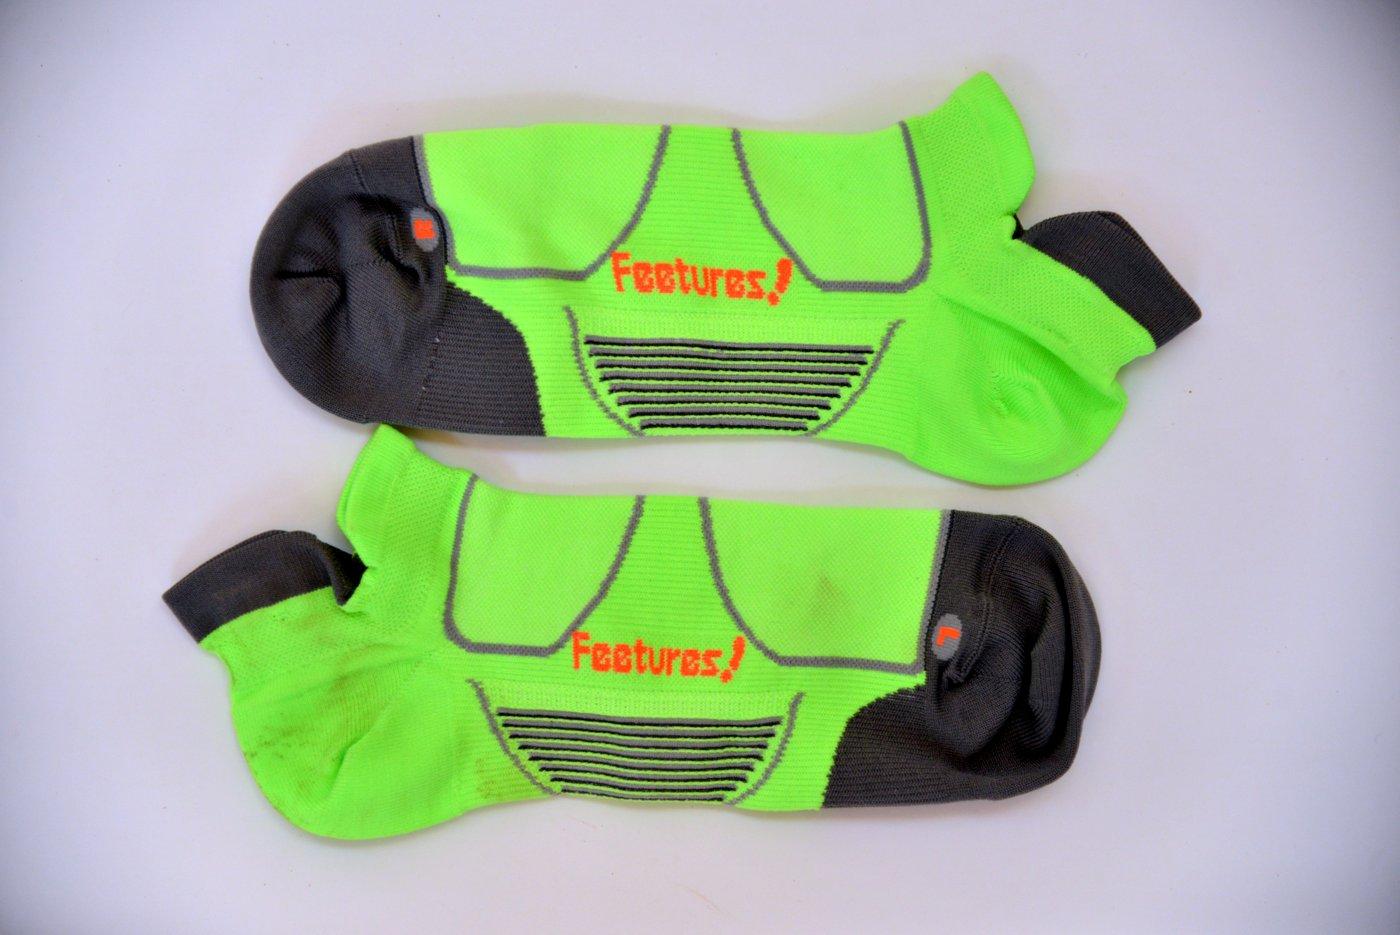 Features running socks